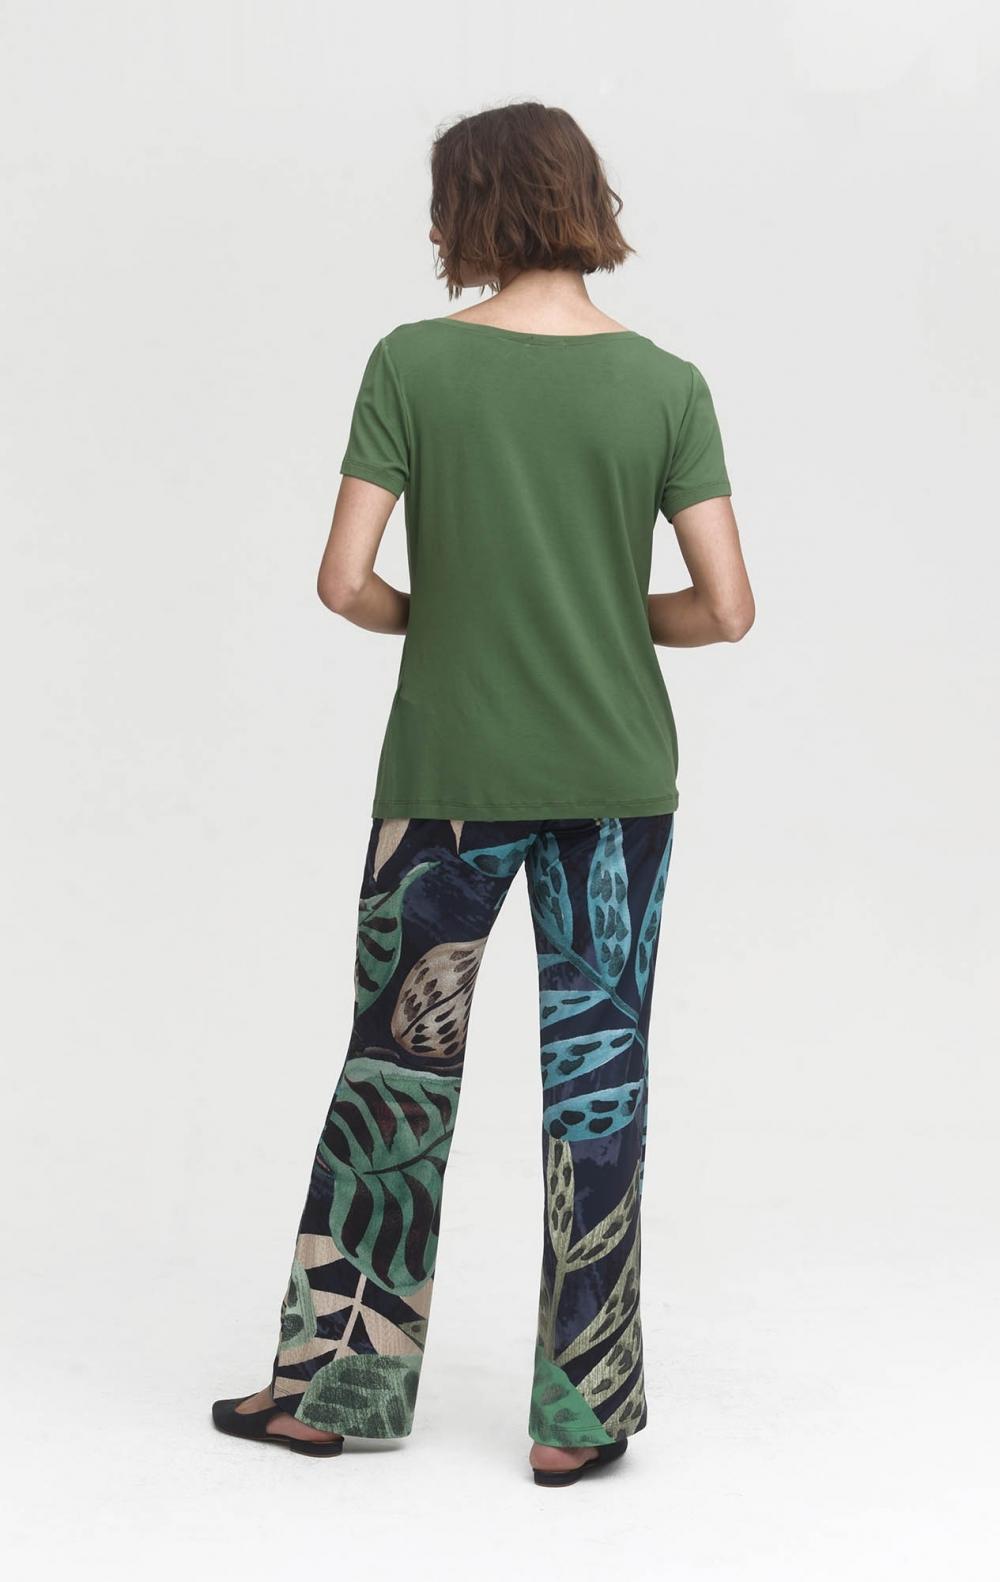 Camiseta Visco Helena Verde  - Foto 2